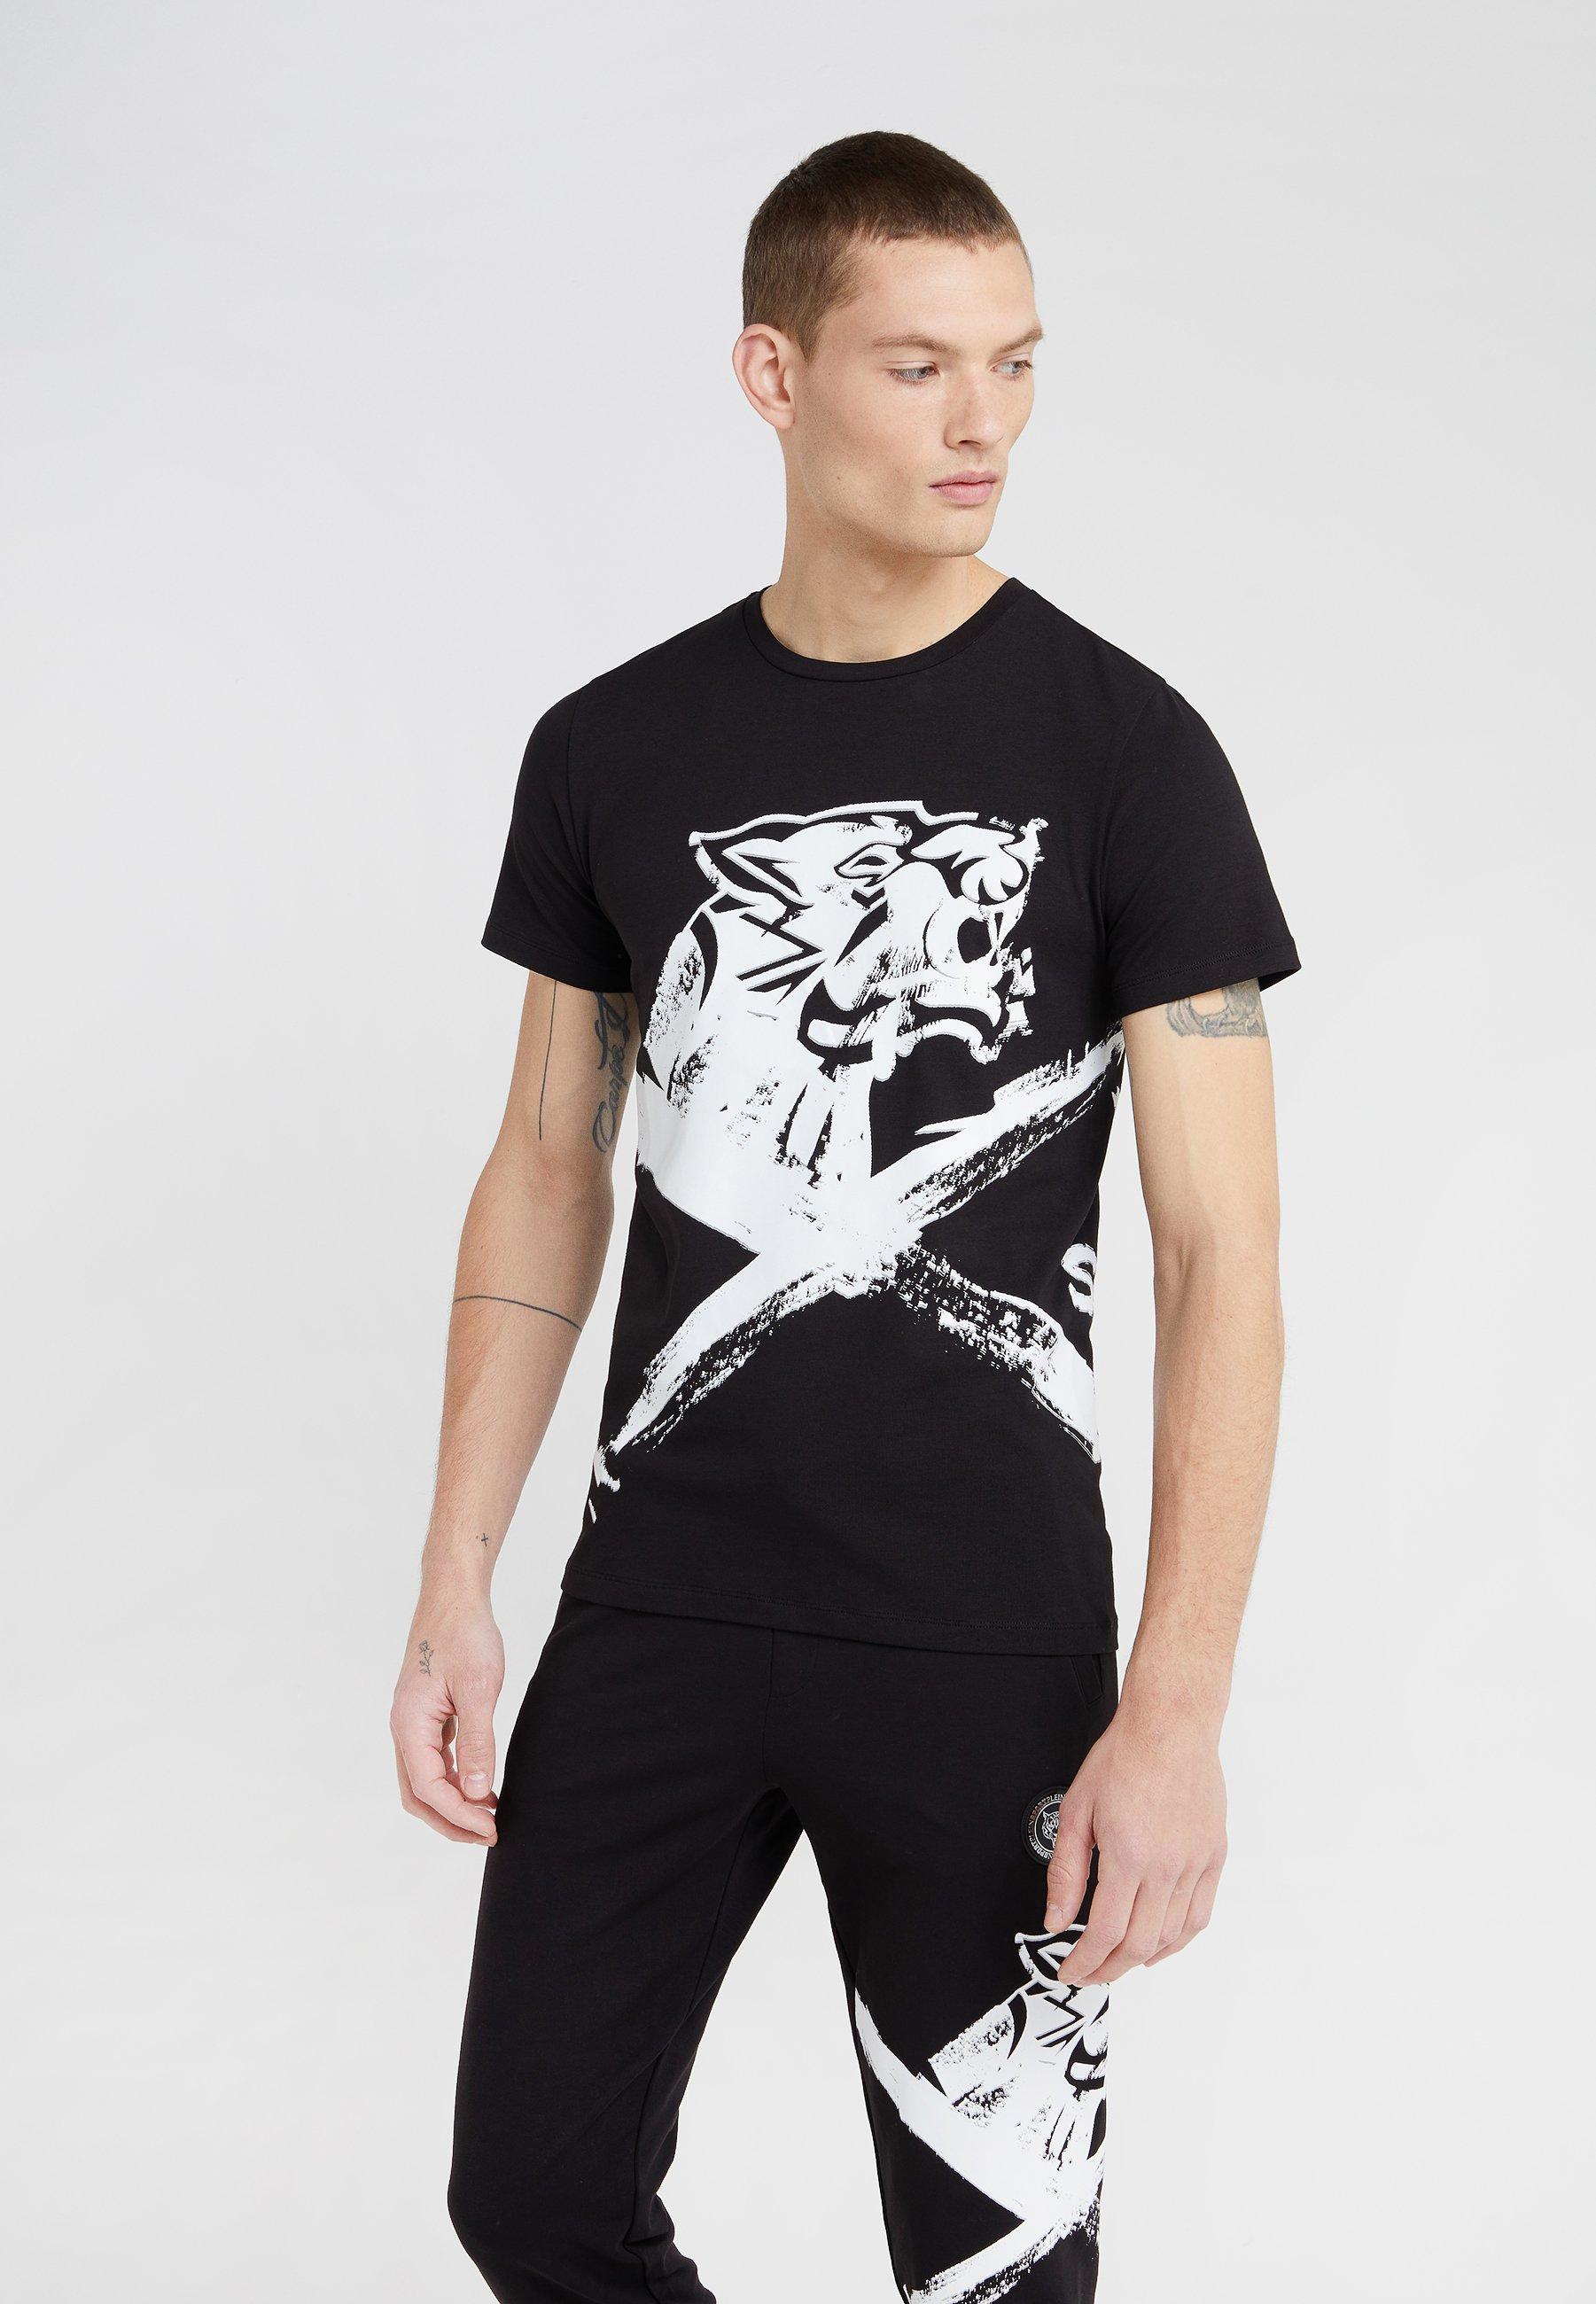 Plein CrossT Round Sport Neck Black Imprimé shirt shdtrQ